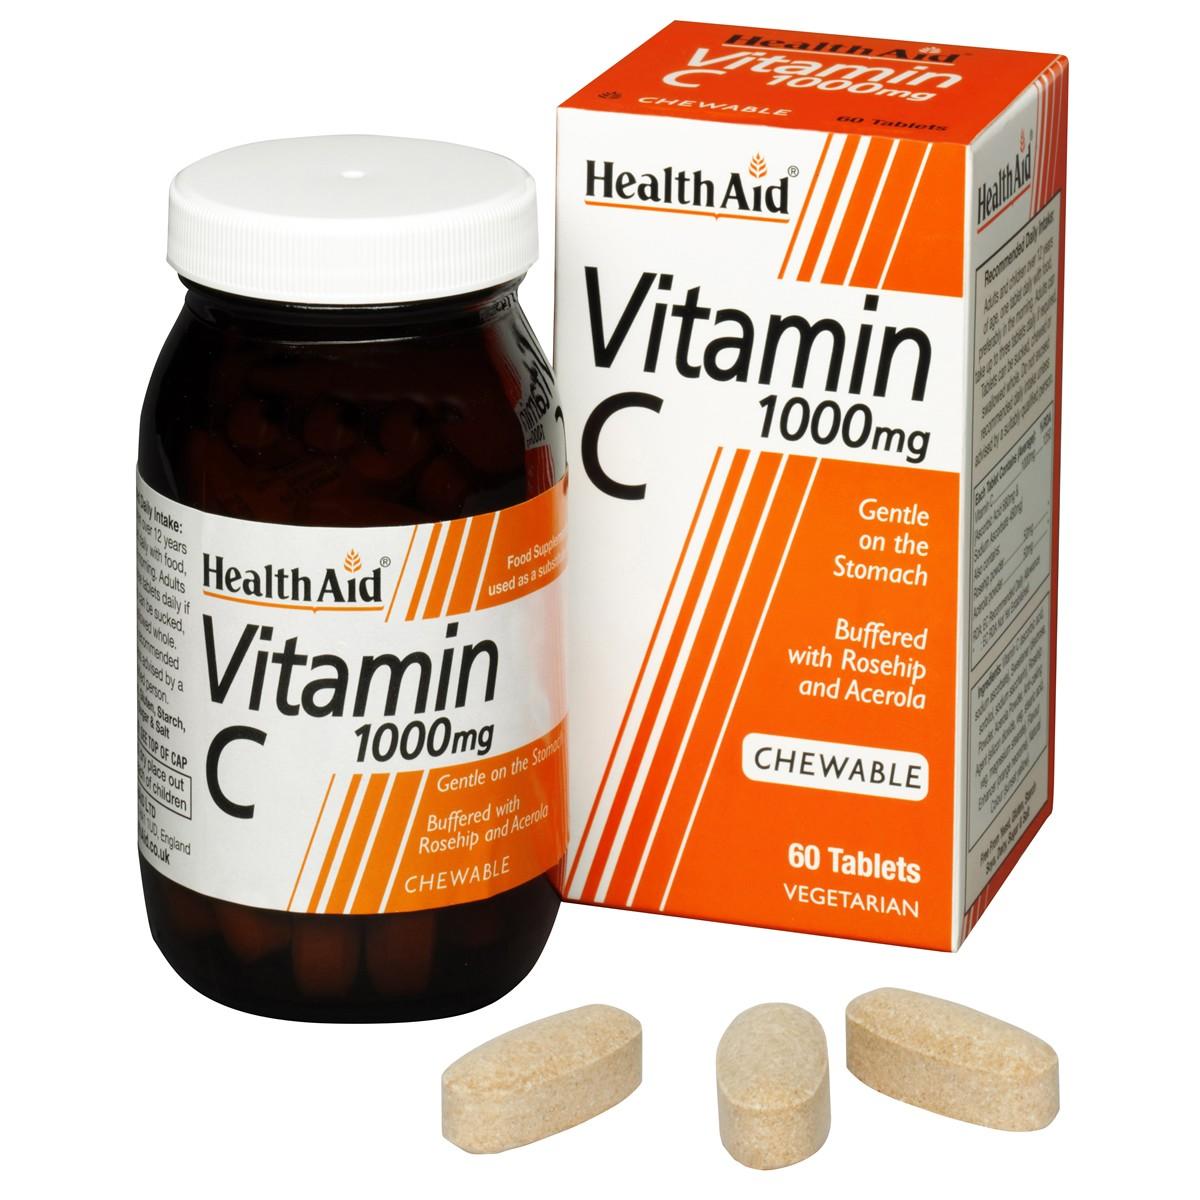 HealthAid Vitamin C 1000mg - Chewable (Orange Flavour)